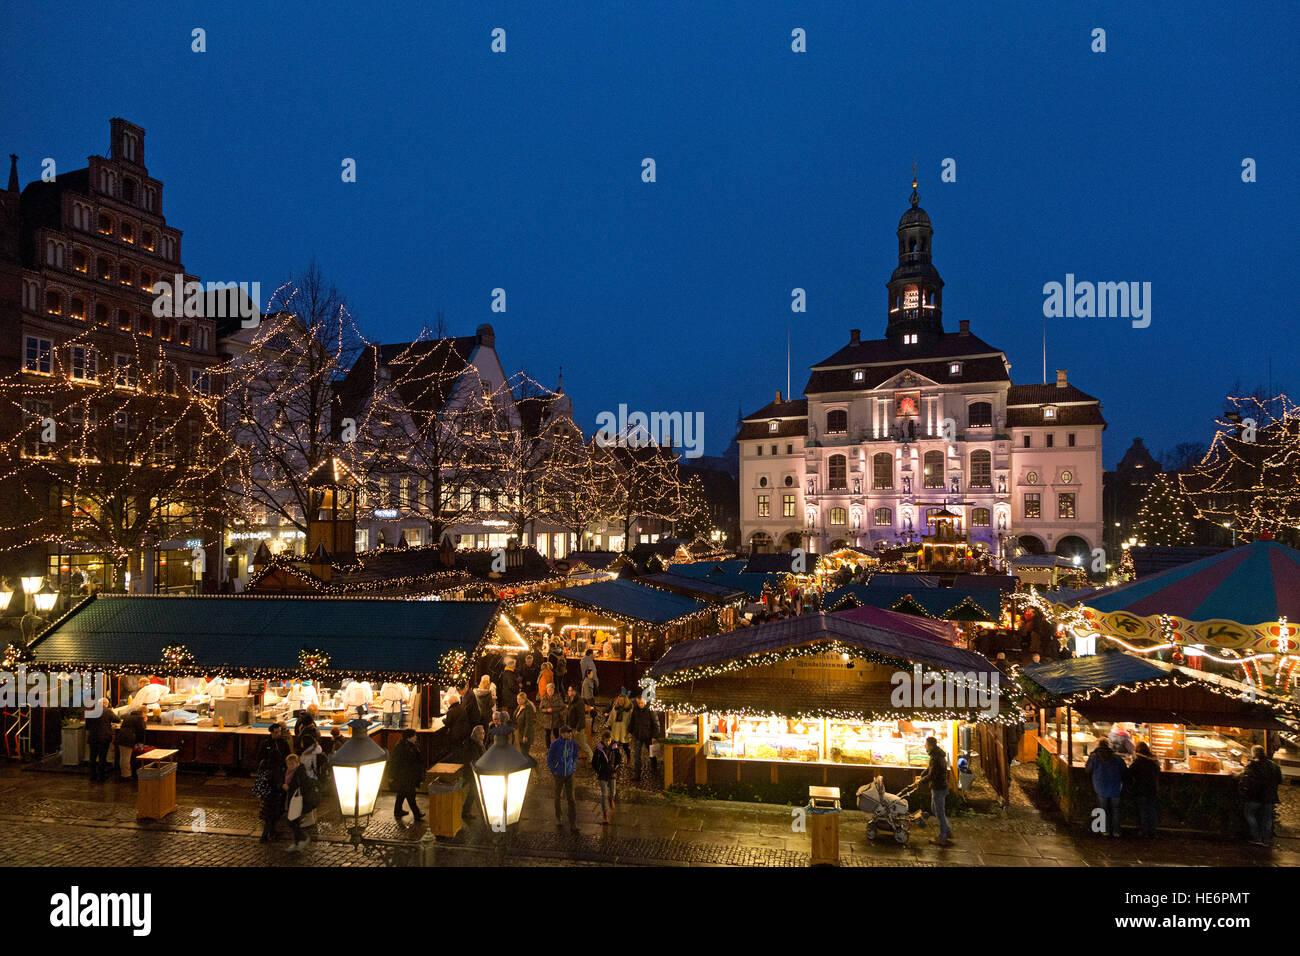 Christmas Market, town hall, Lueneburg, Lower Saxony, Germany Stock Photo